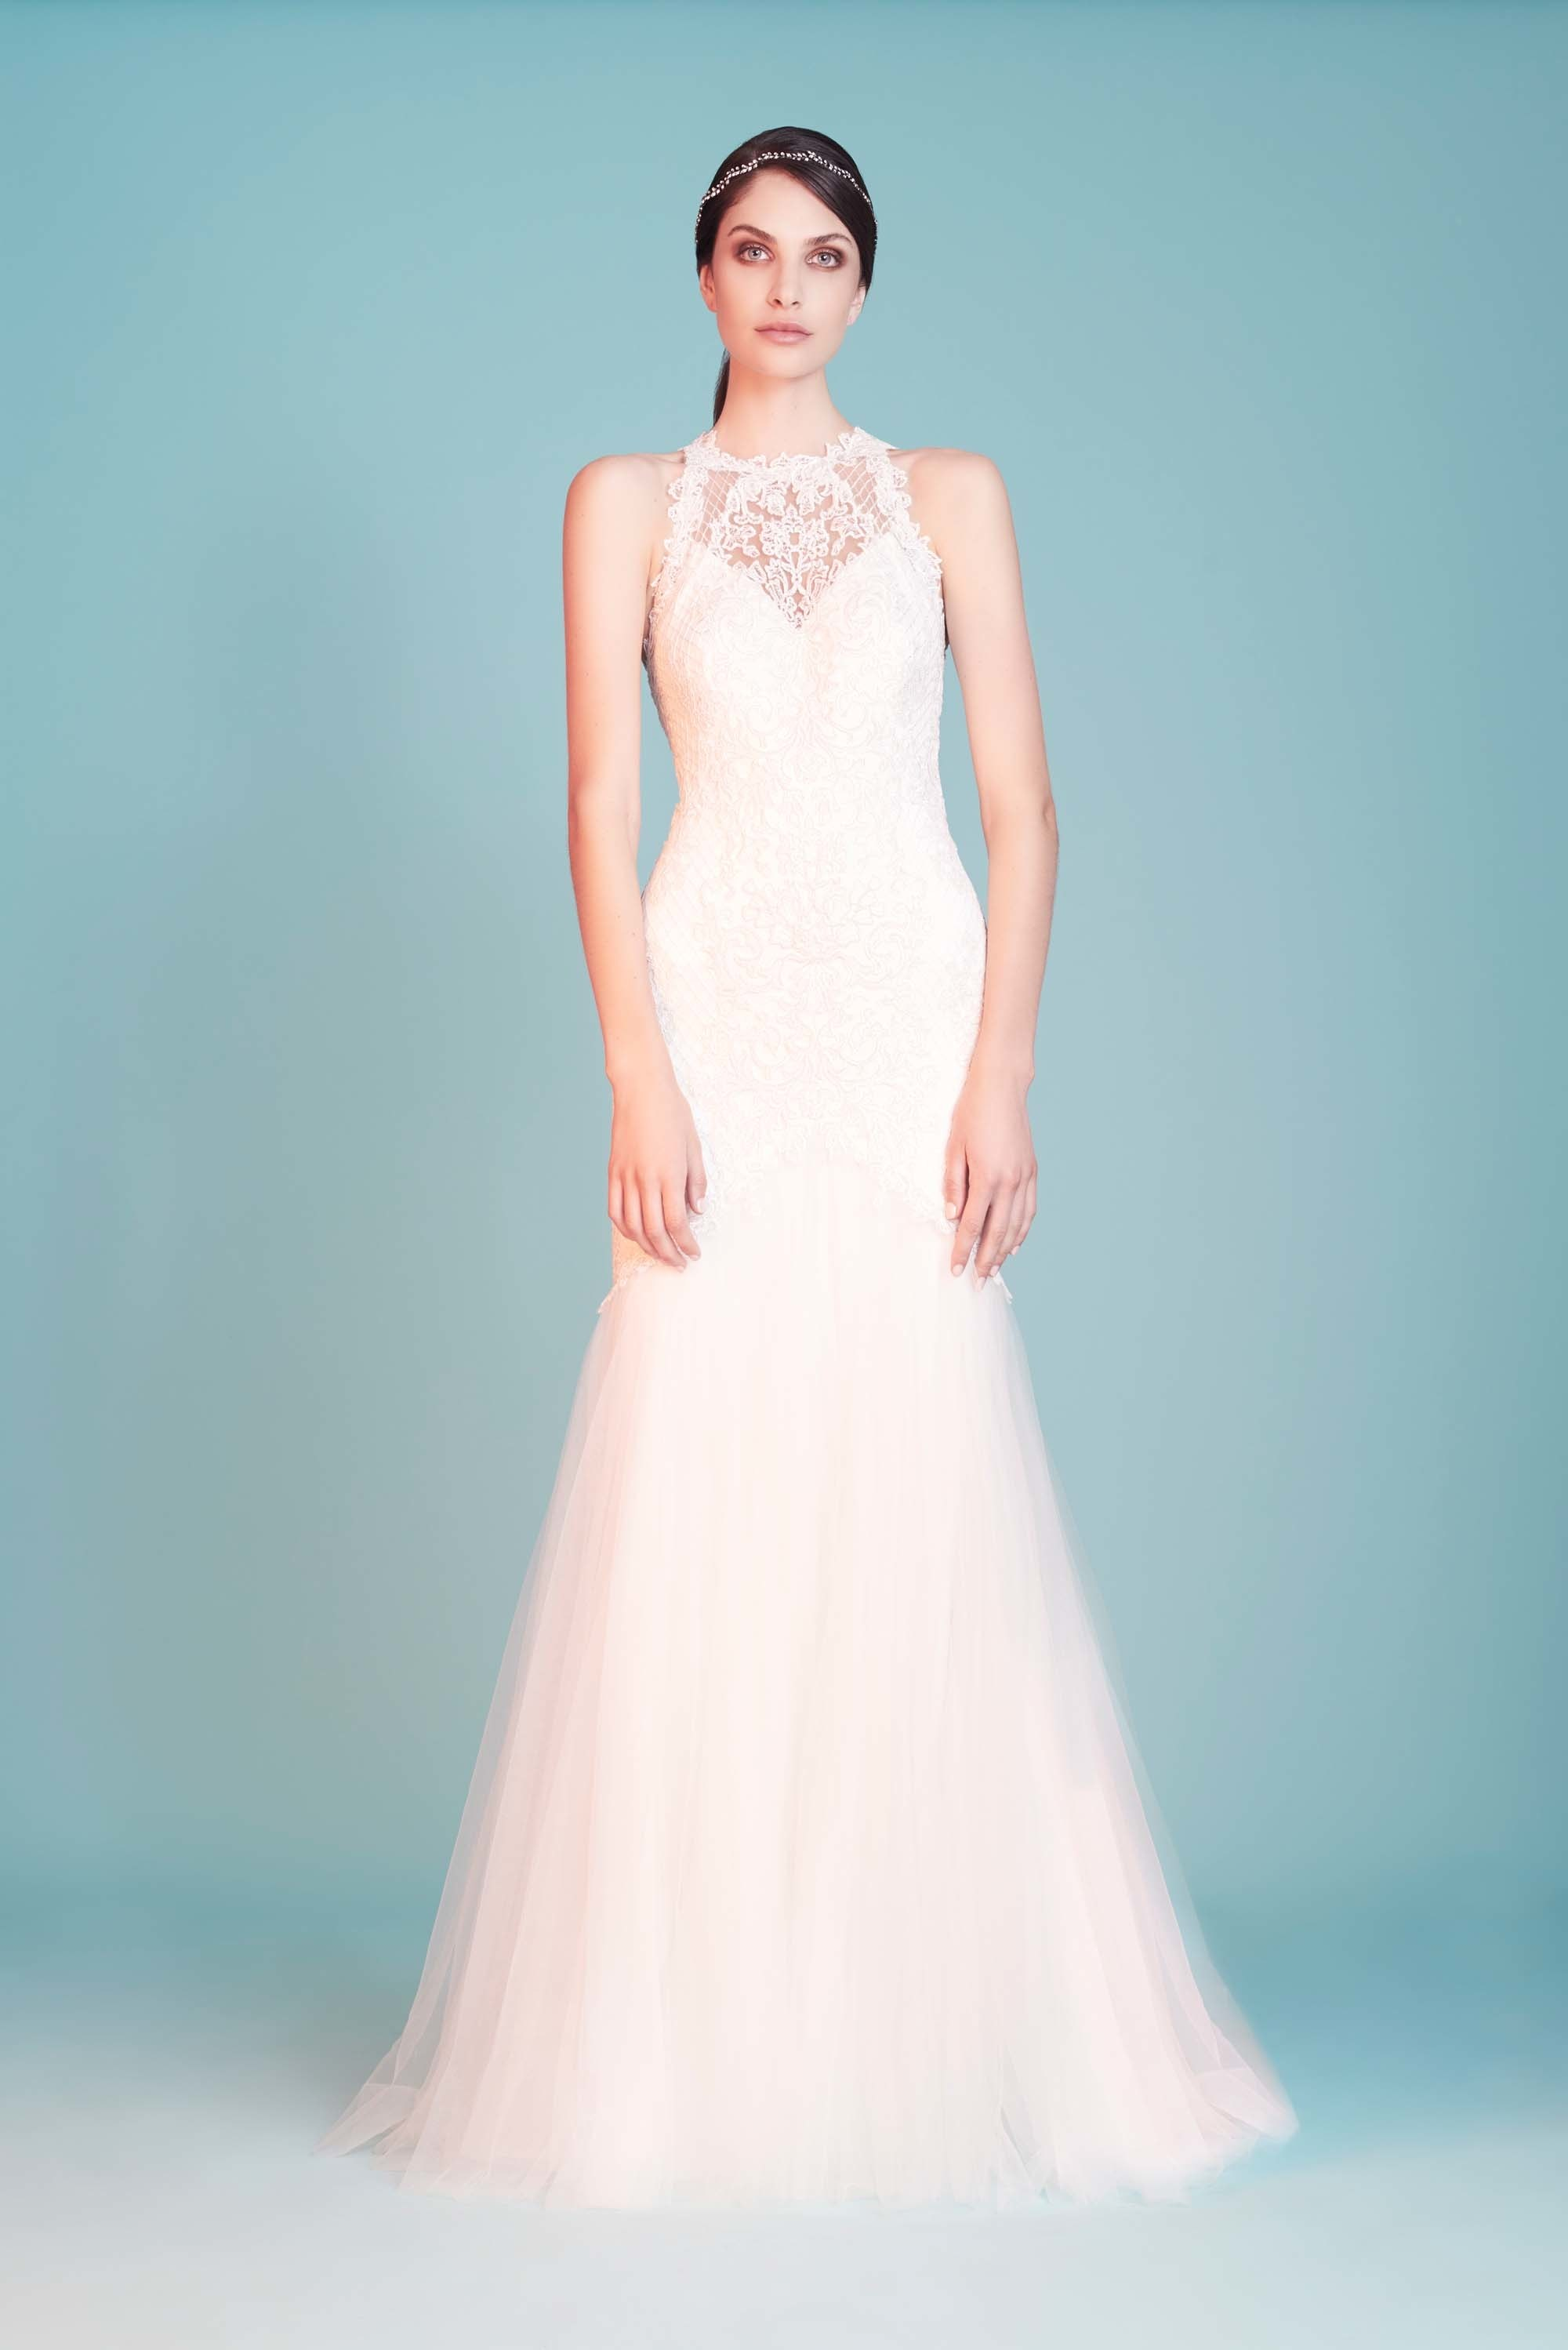 Tadashi Shoji Spring 2018 Bridal Lookbook - The Impression